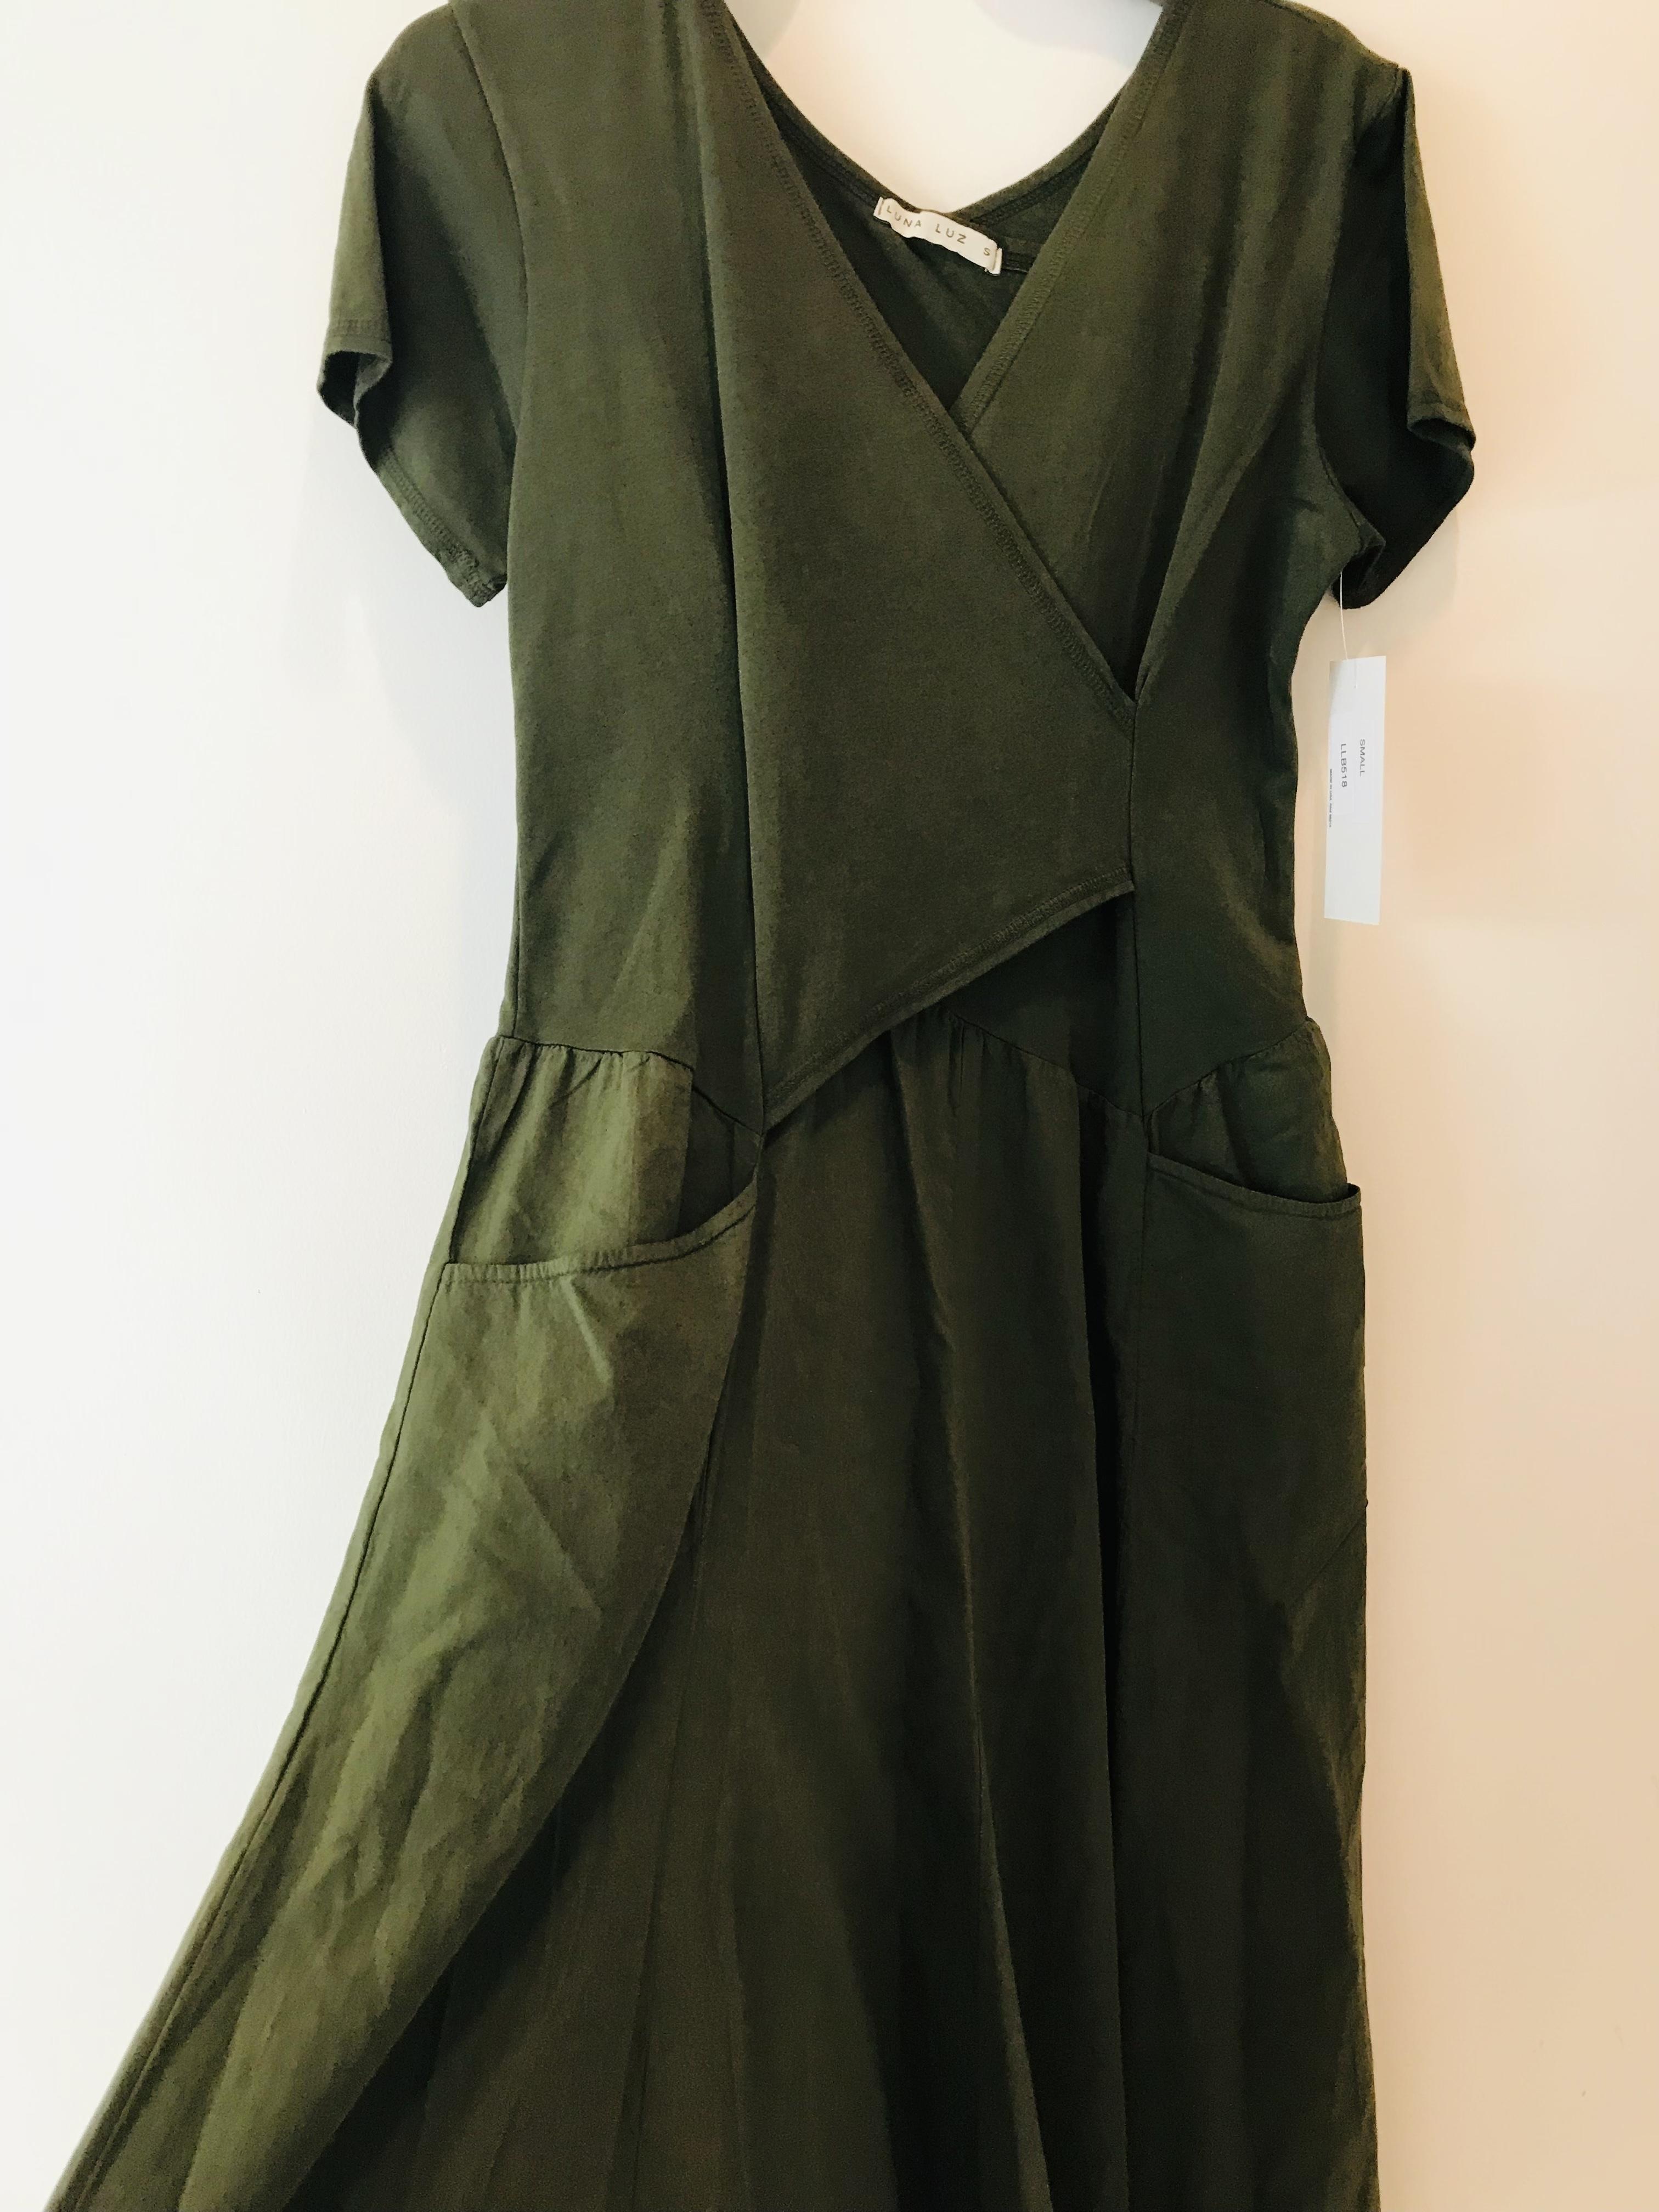 Luna Luz: Short Sleeve Cross Over Bodice Long Dress (More Arriving: NEW Fall Color - Olive!) LL_518_OLIVE